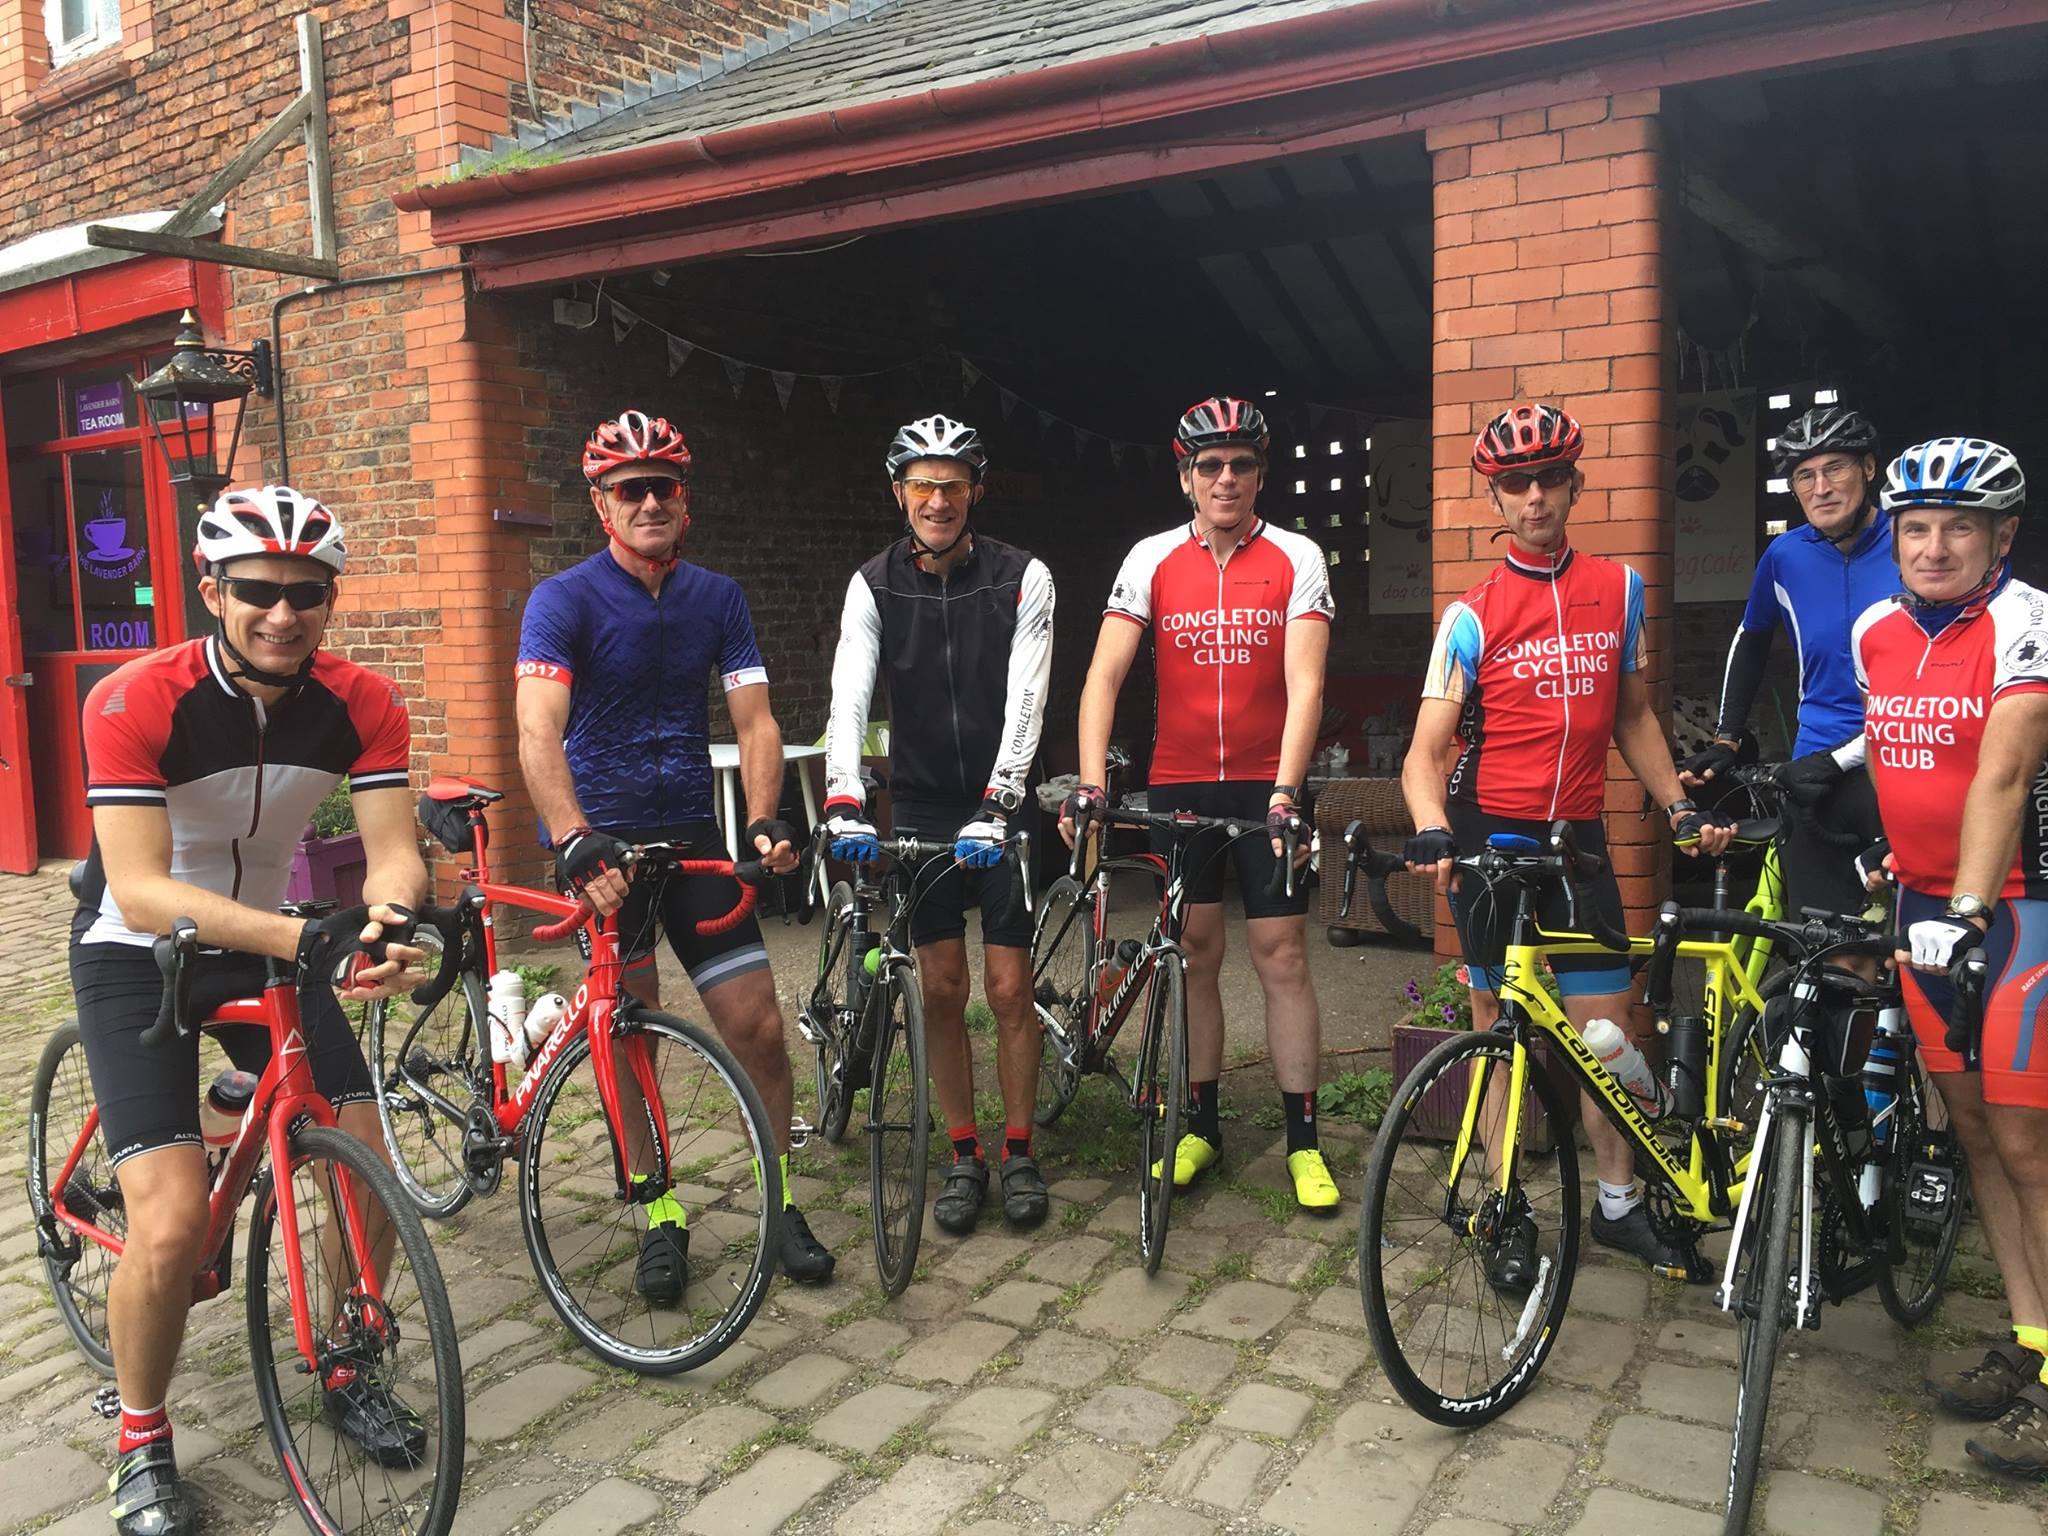 Congleton Cycling Club at the Lavender Barn